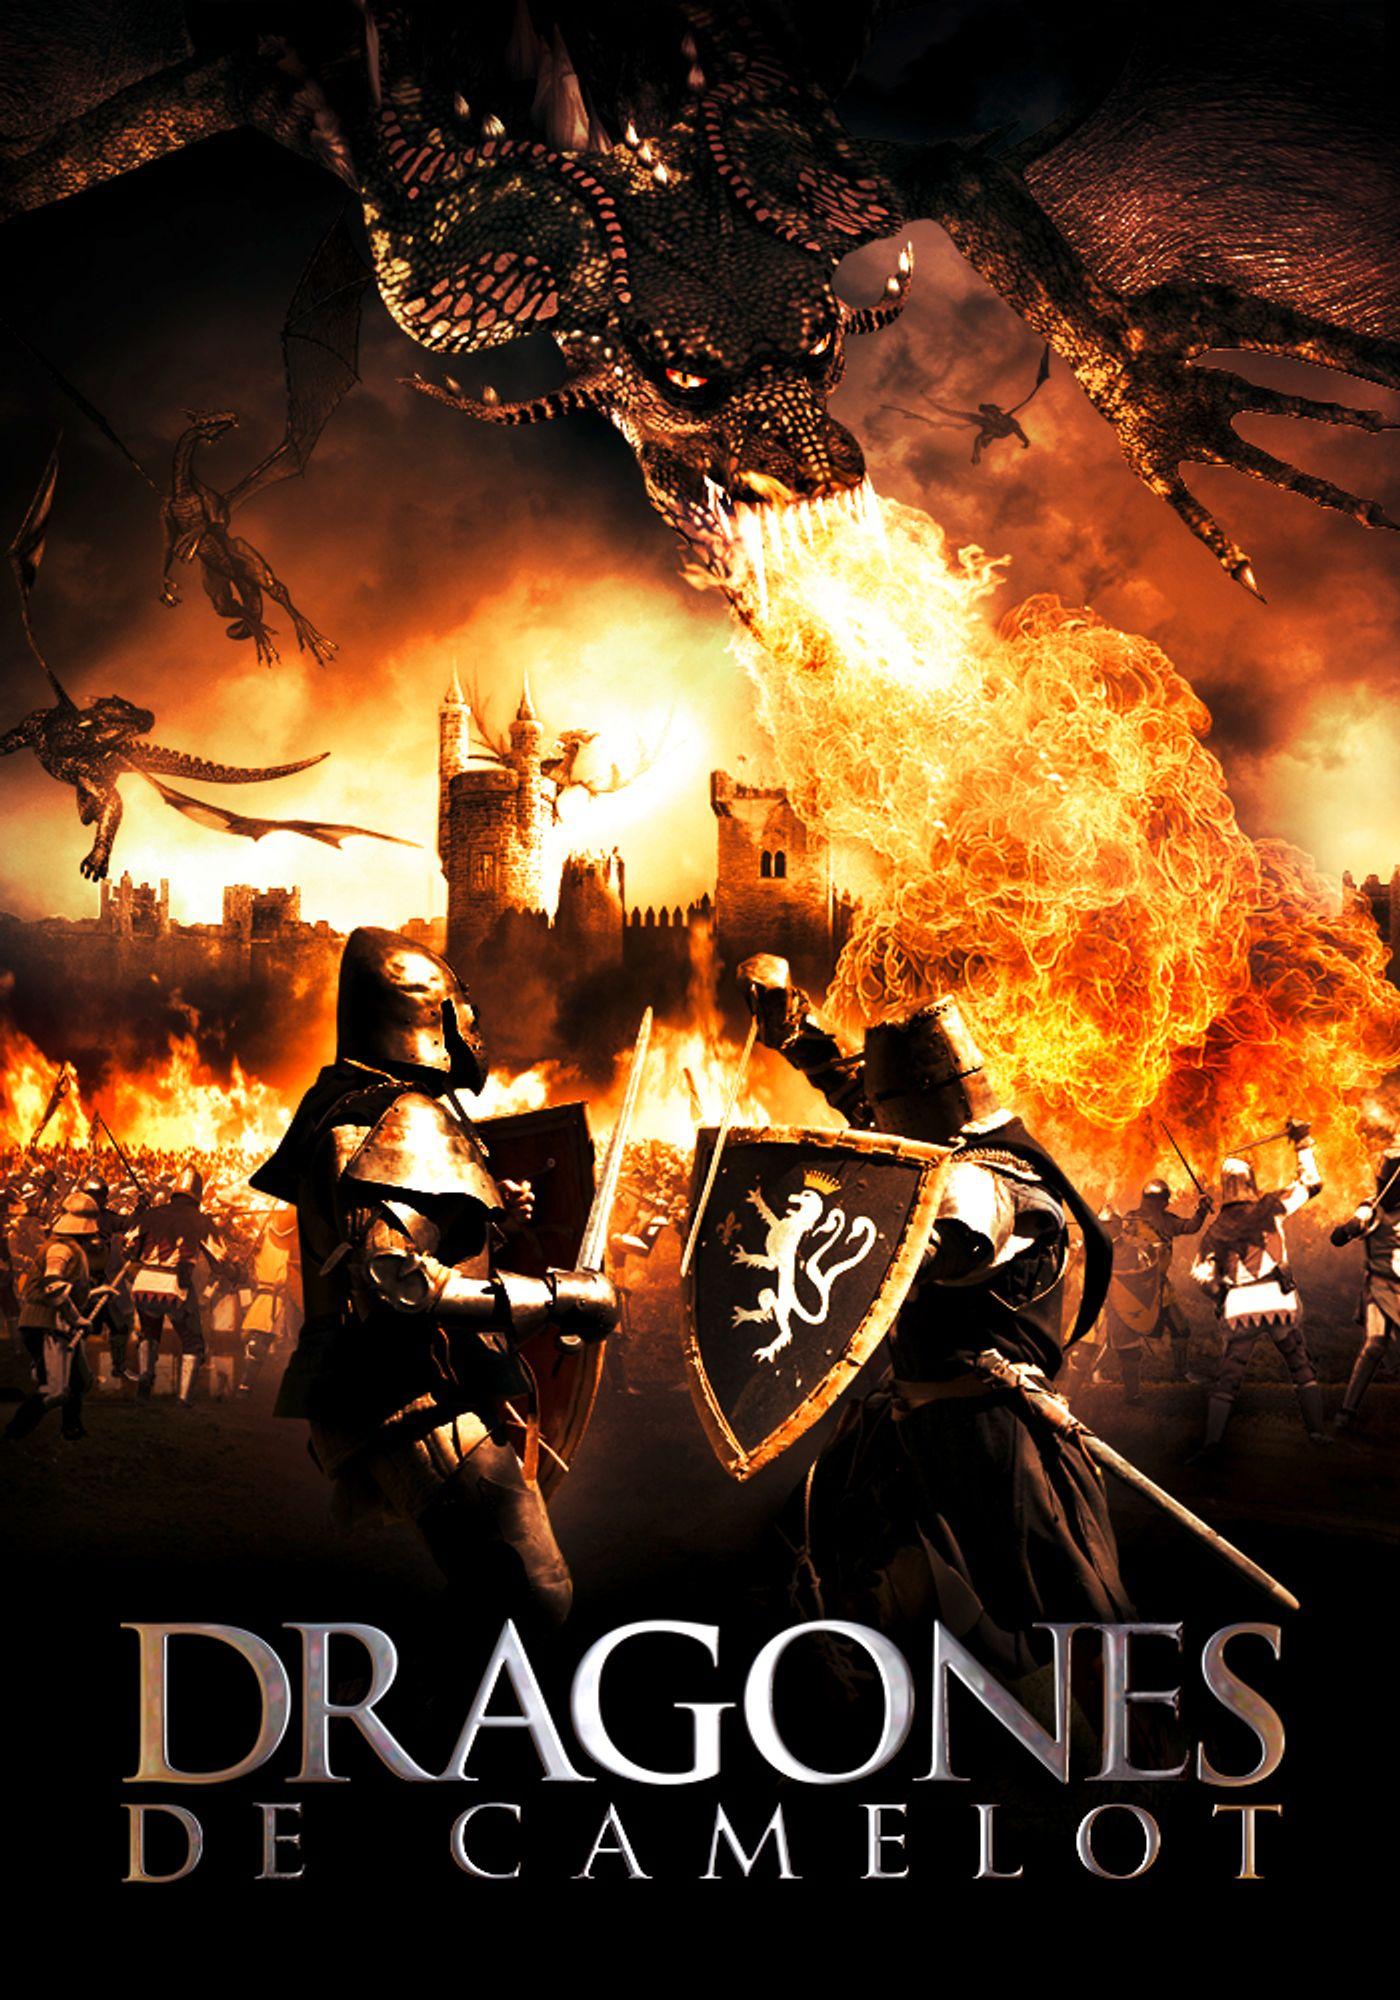 DragonesDeCamelot_MITELE-PLUS_700x1000